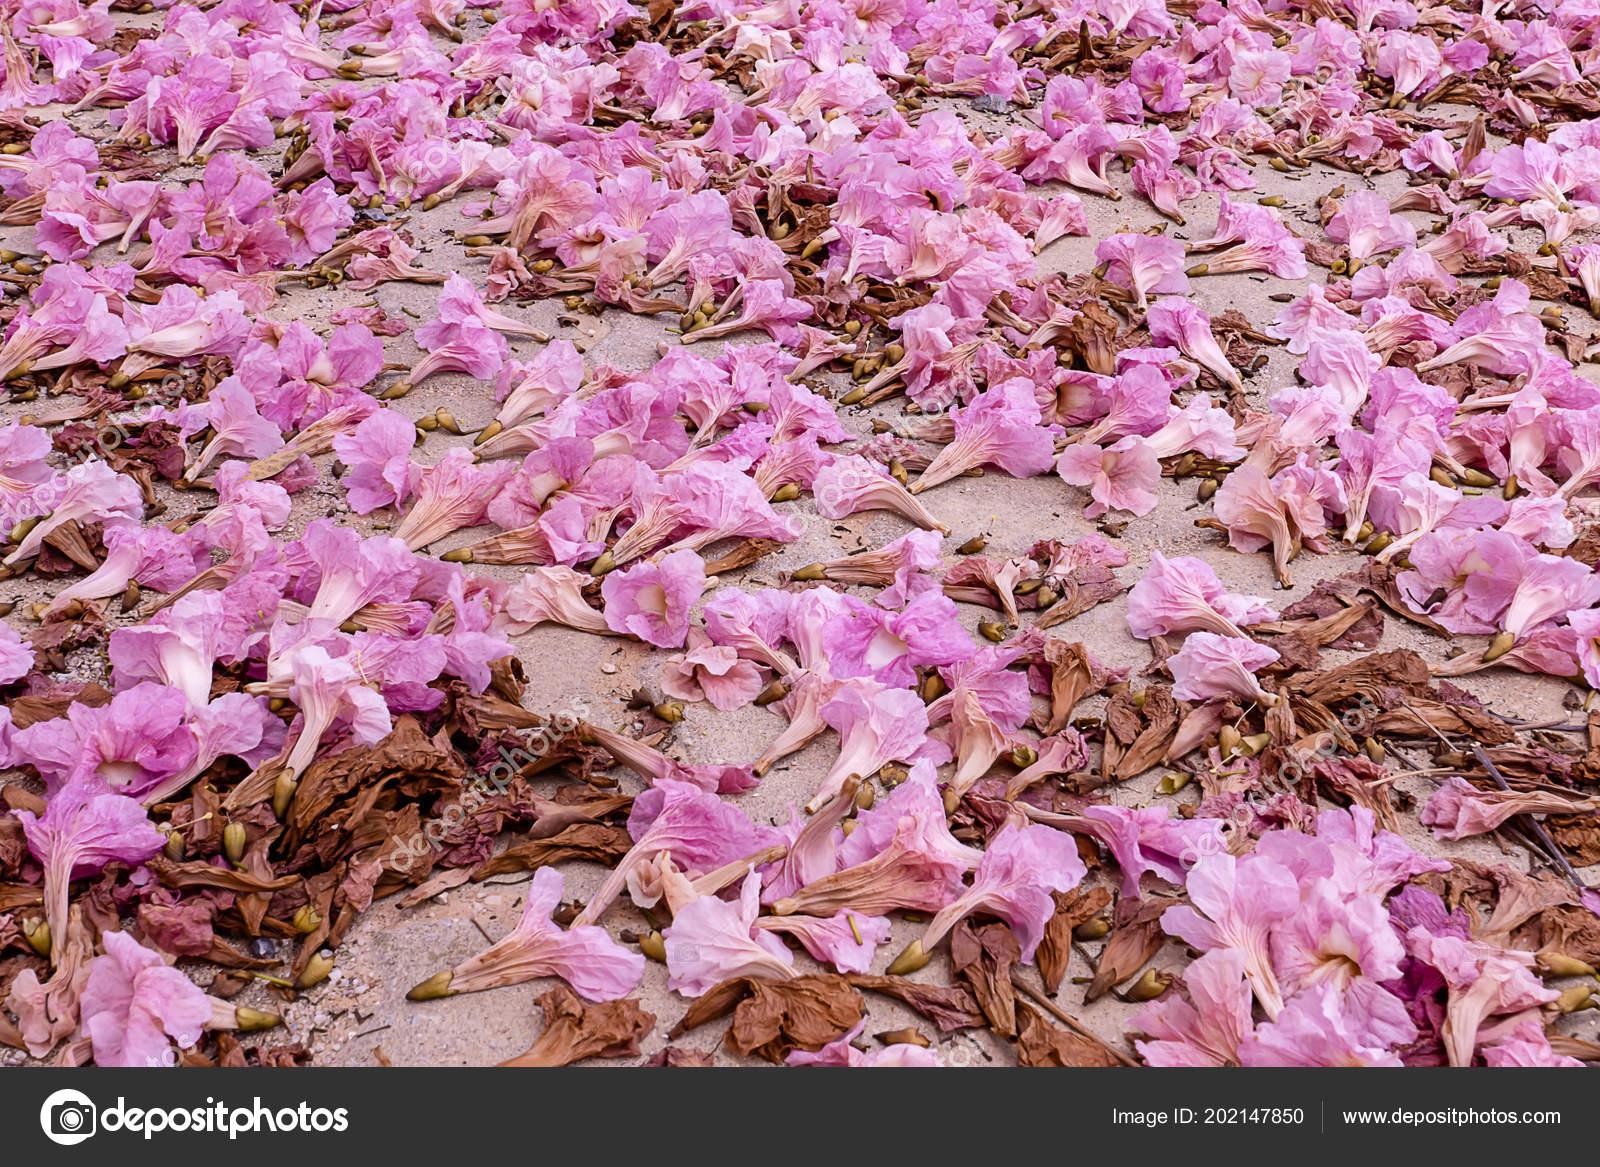 Pink trumpet flower fall ground tabebuia rosea tree stock photo pink trumpet flower fall ground tabebuia rosea tree stock photo mightylinksfo